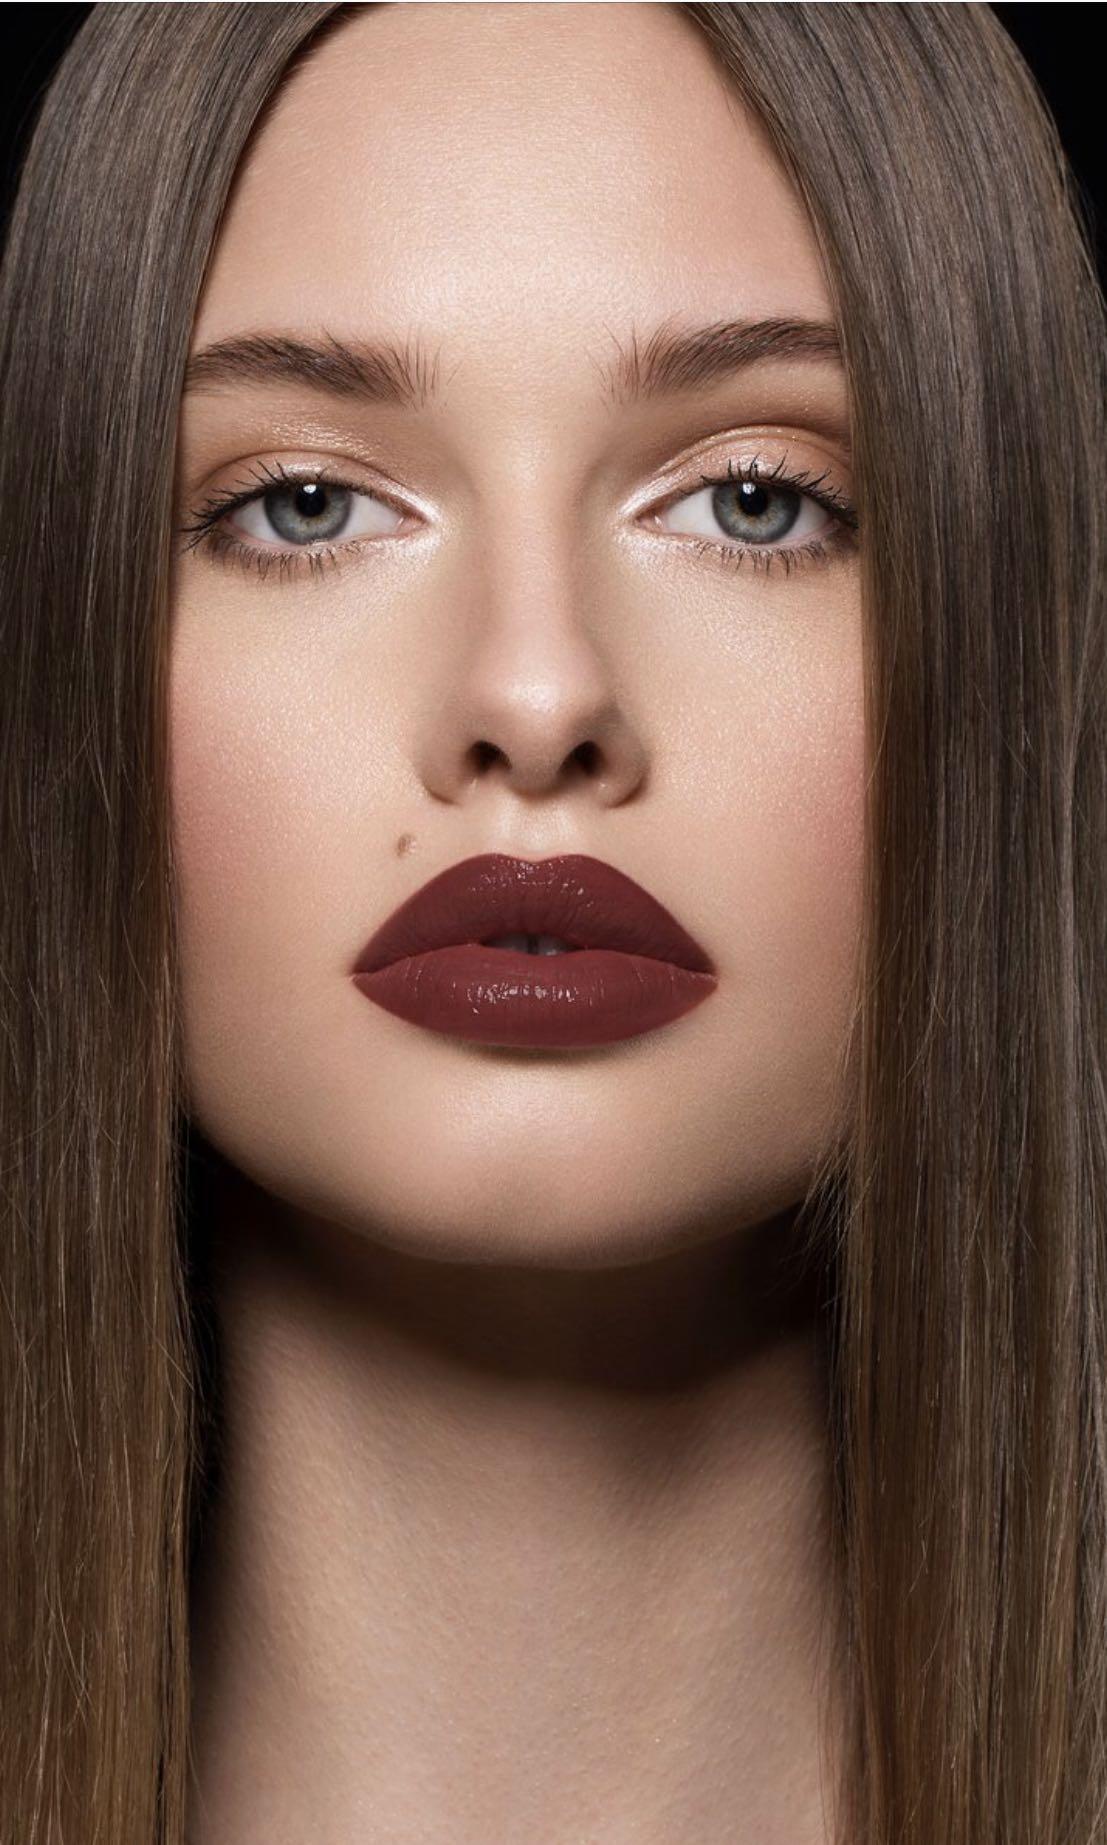 Brand New - ColourPop LUX Lipstick - 27 ❤️ AUTHENTIC